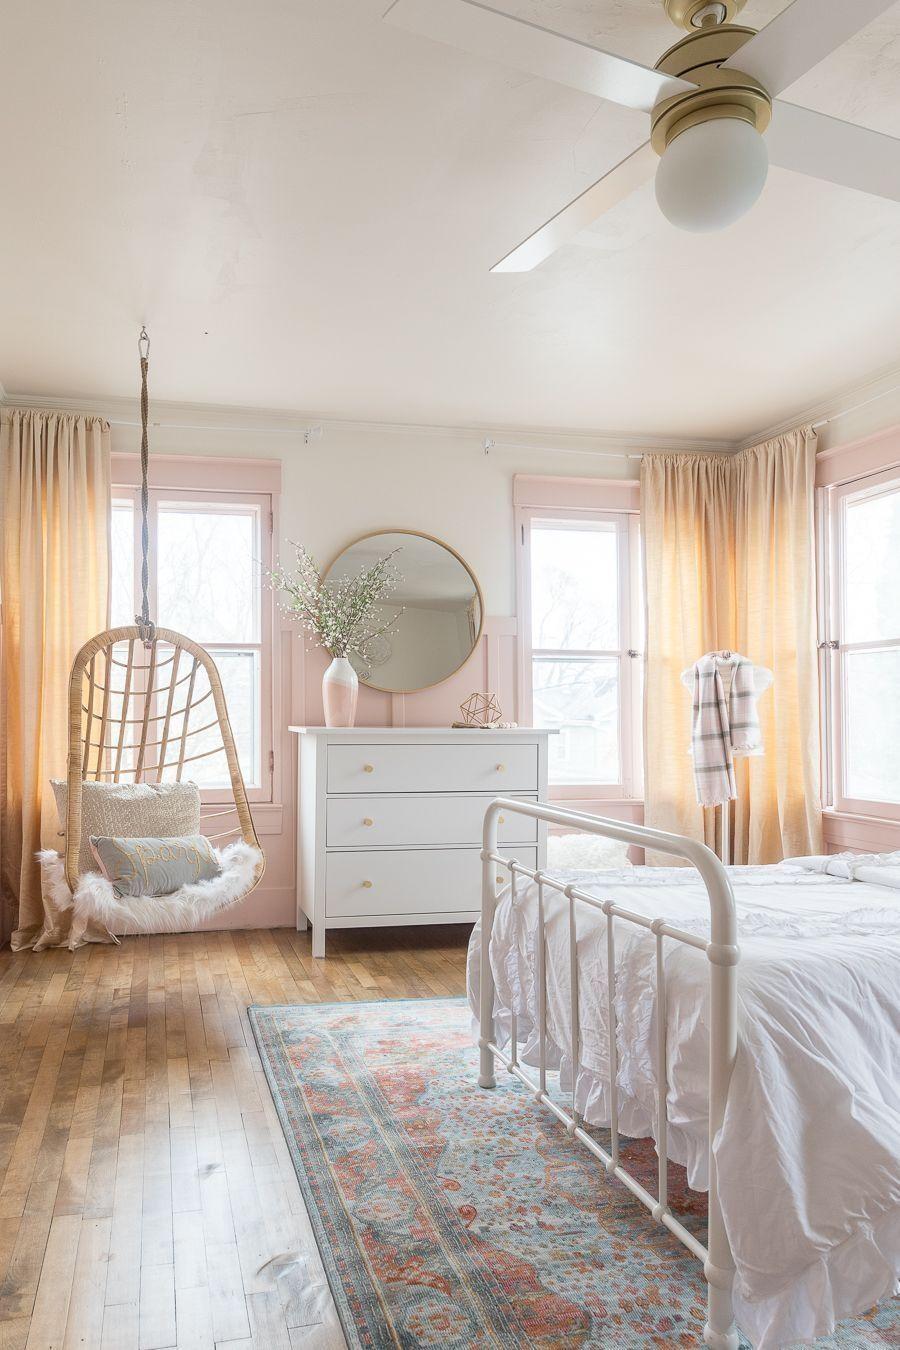 55 charming pink kids bedroom design decorating ideas decor pink rh pinterest com